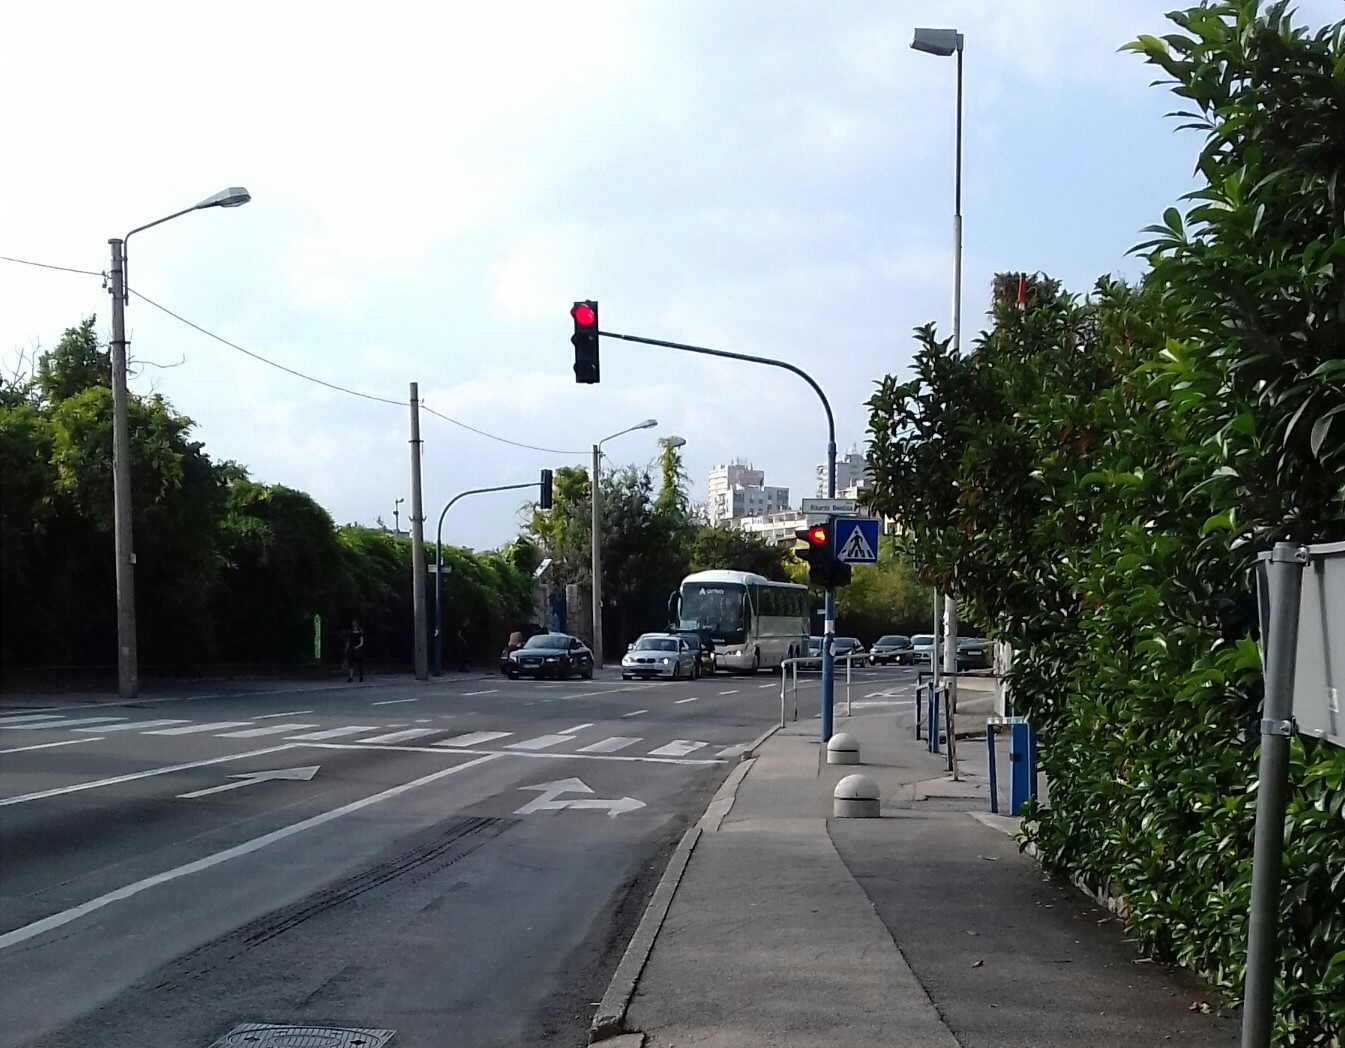 Prometna nesreća, Audi i Volkswagen, Zvonimirova ulica / Foto NL